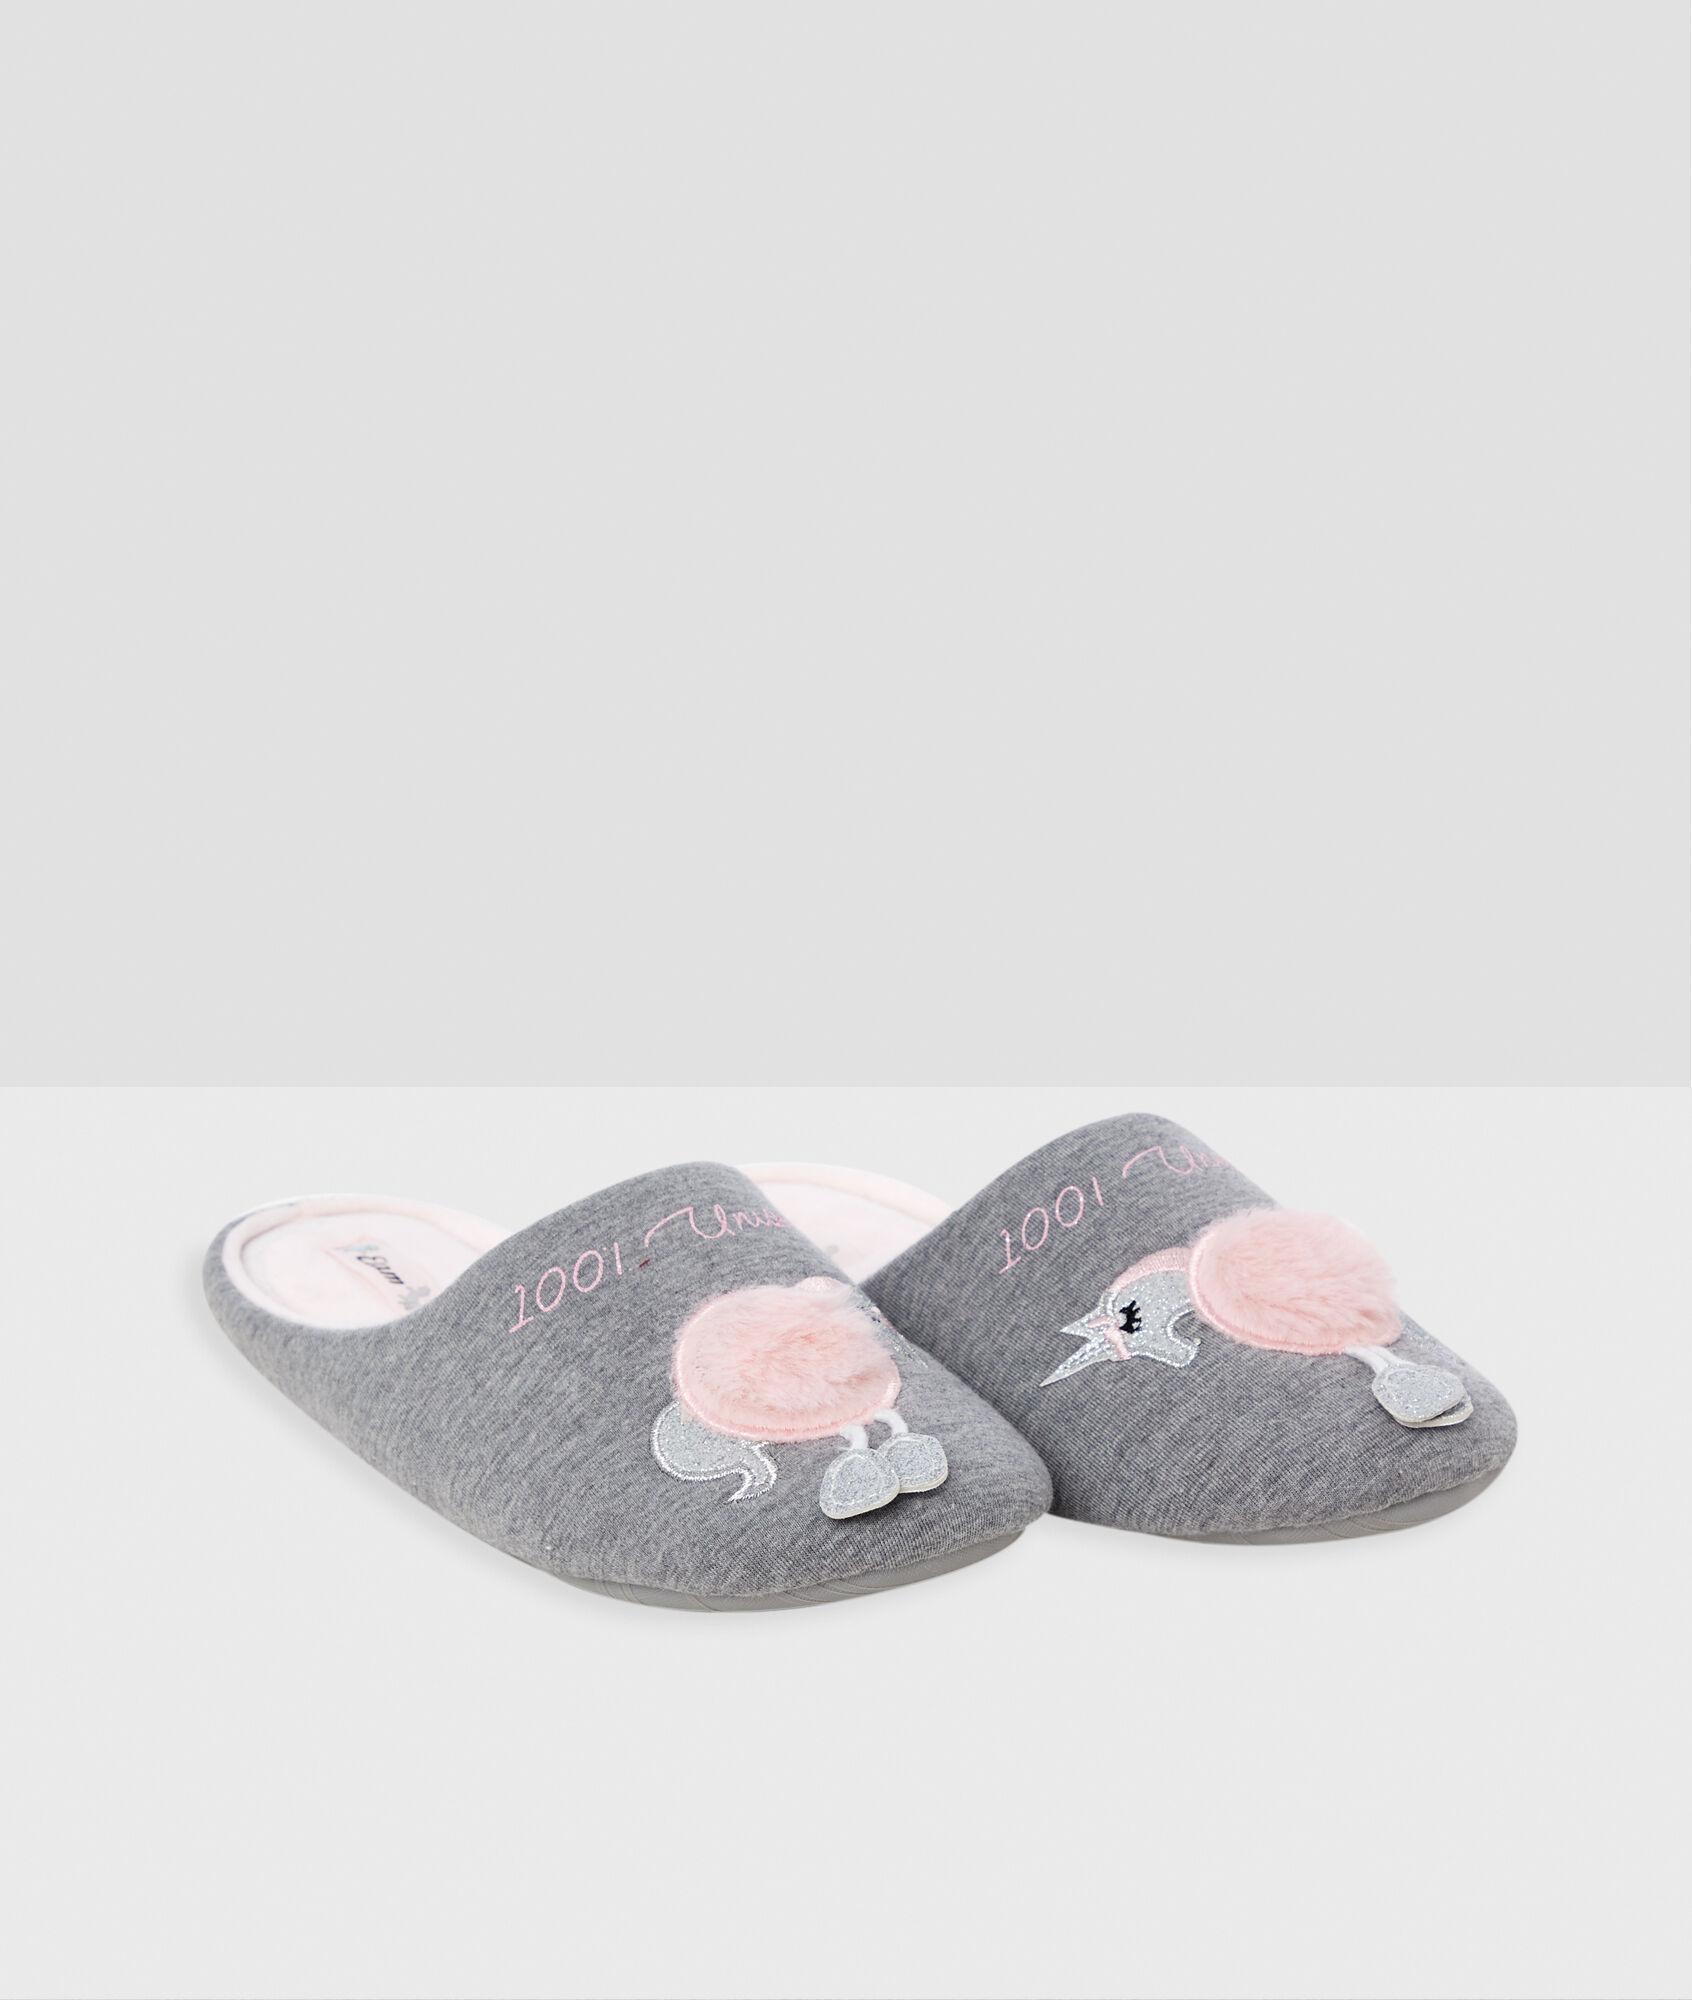 0705f7f87e7 Pantofle s jednorožcem - Etam